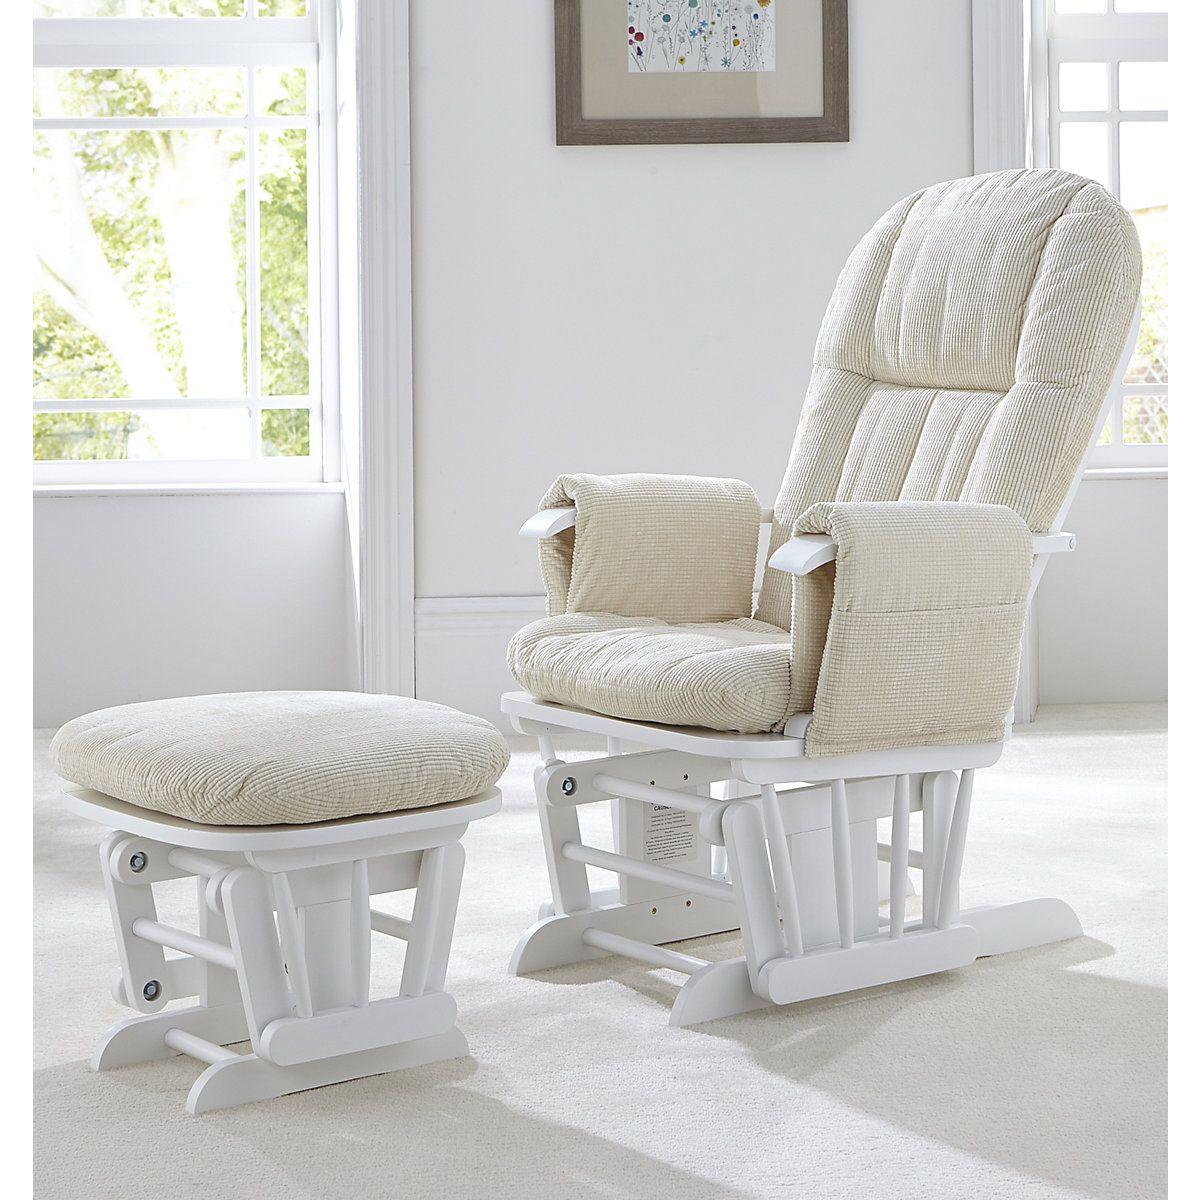 Magnificent Tutti Bambini Deluxe Reclinable Glider Chair And Stool Creativecarmelina Interior Chair Design Creativecarmelinacom